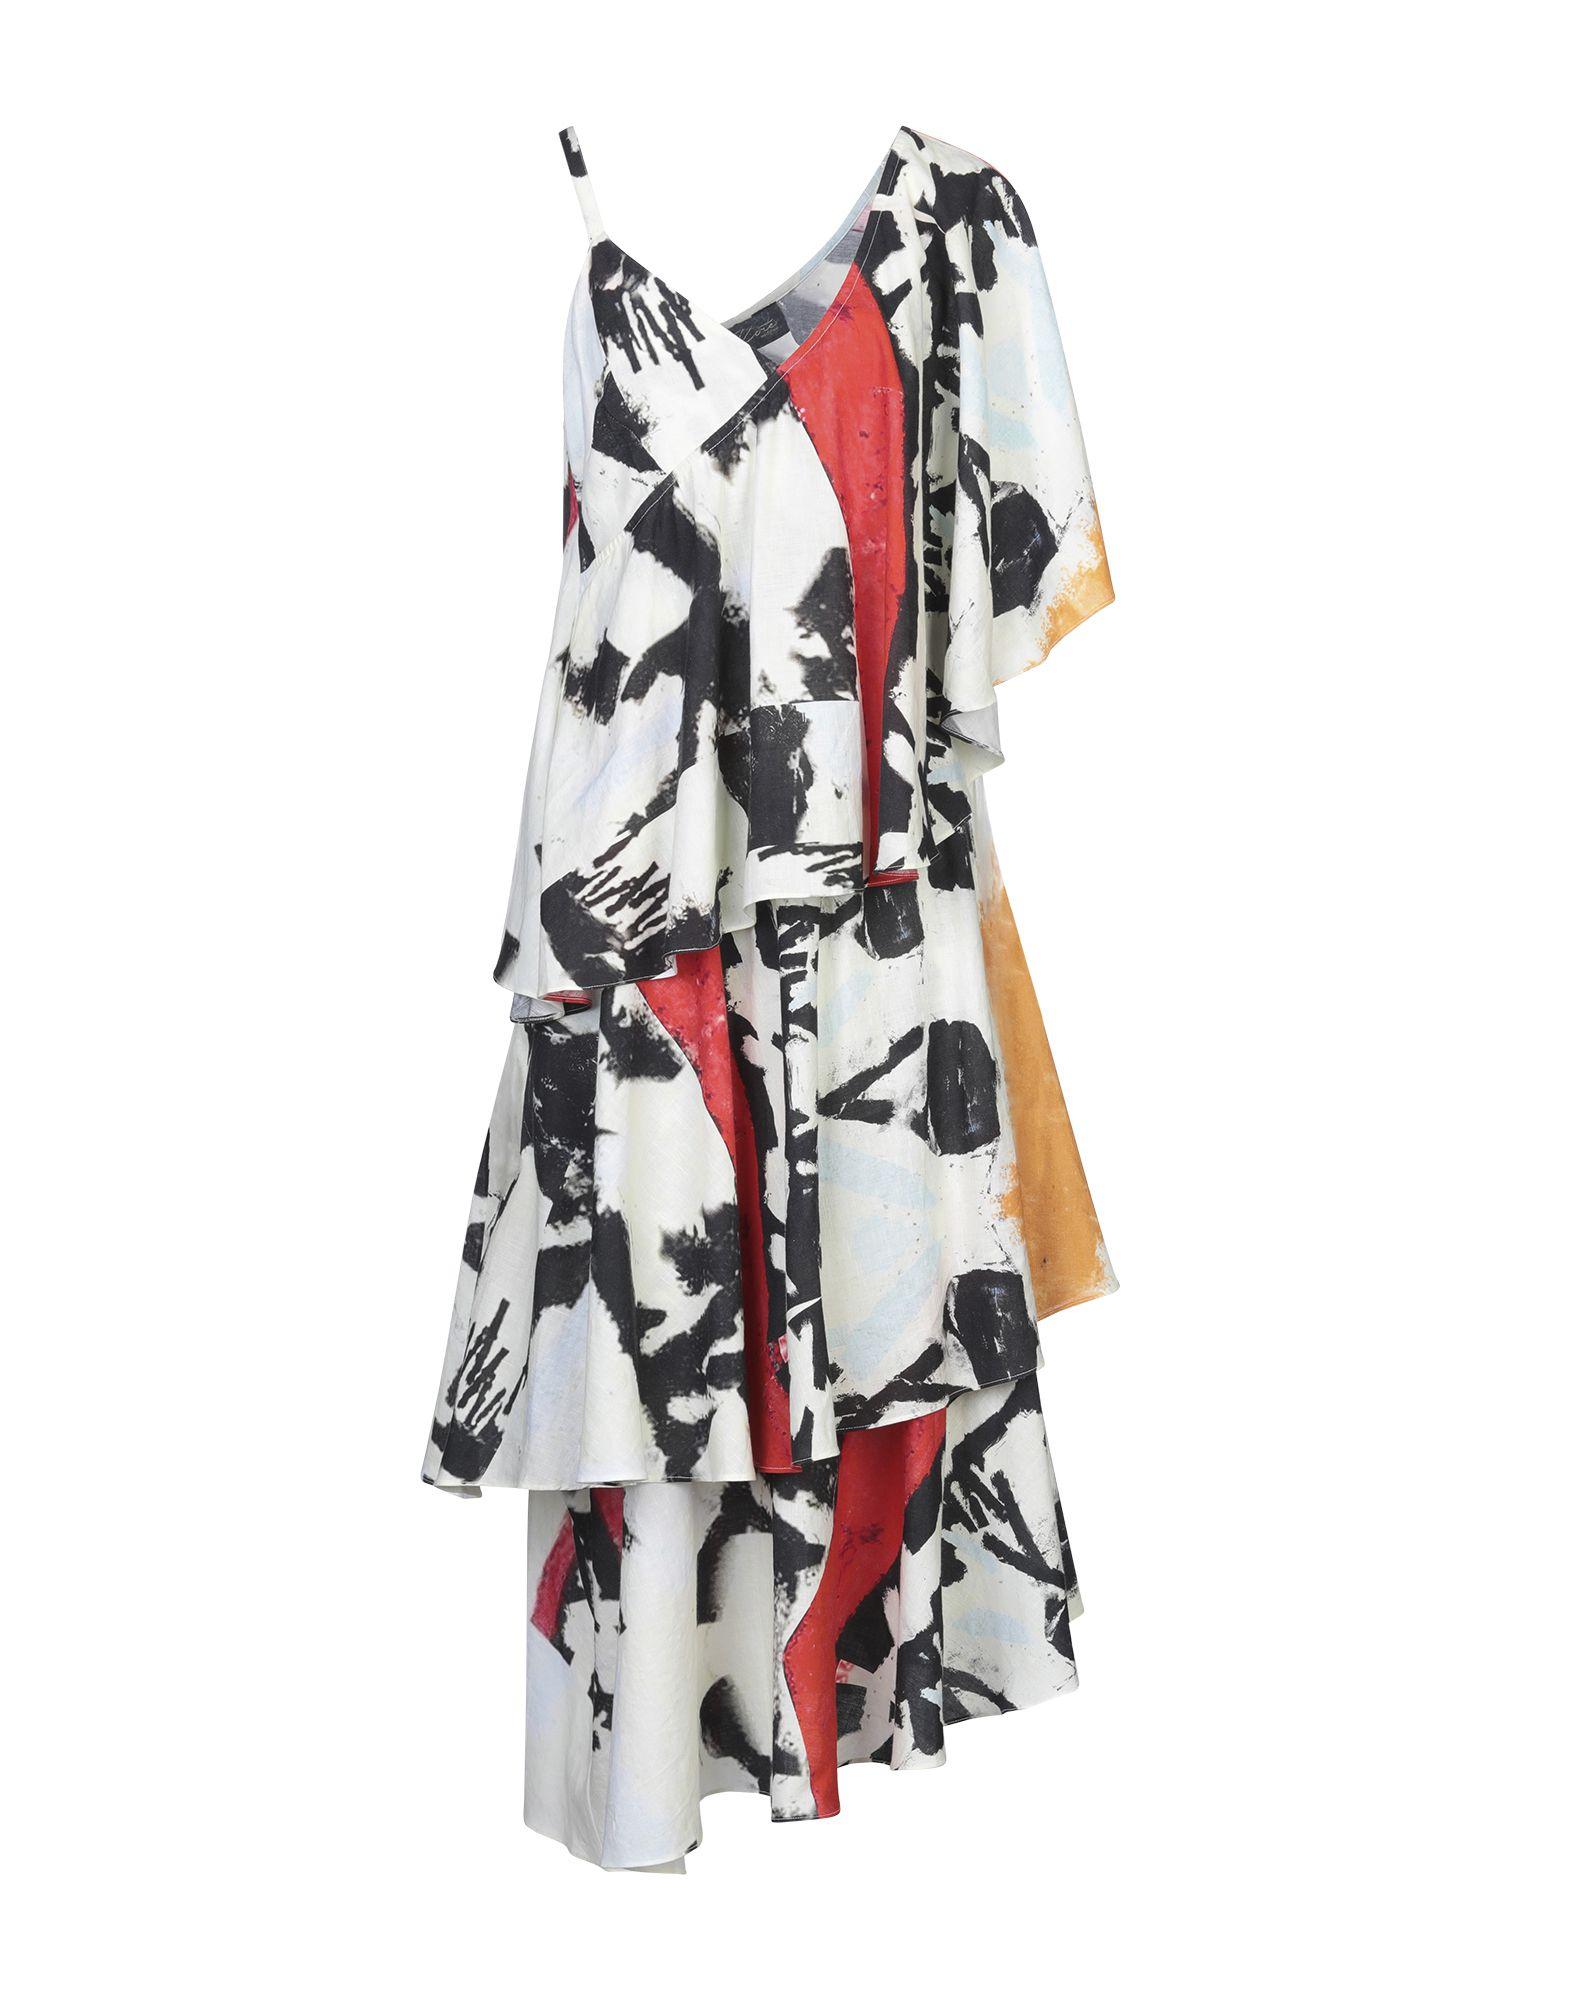 KORE COLLECTIONS Платье длиной 3/4 tart collections юбка длиной 3 4